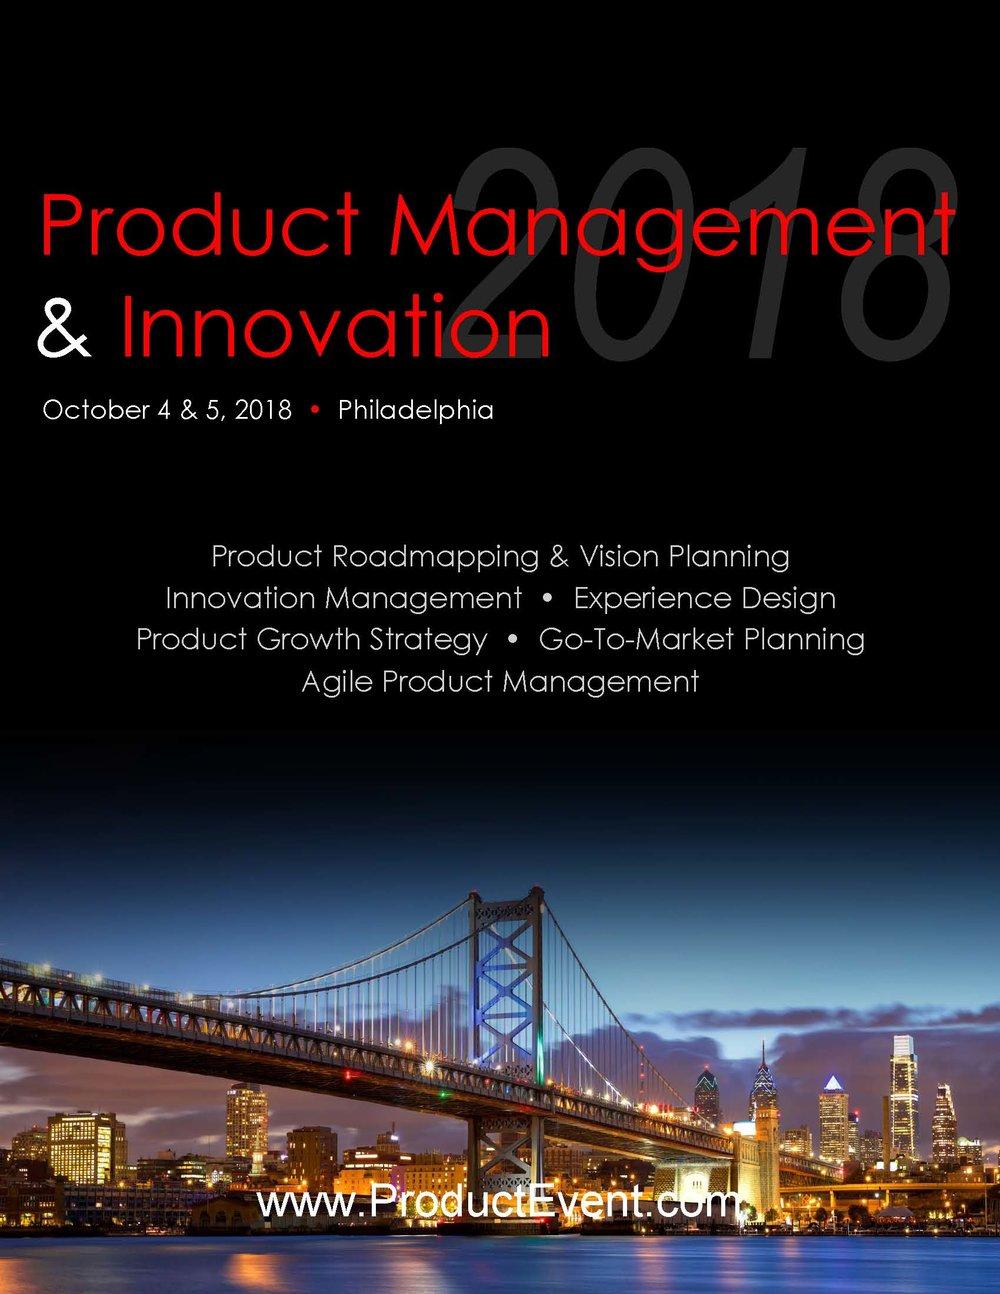 Download full brochure